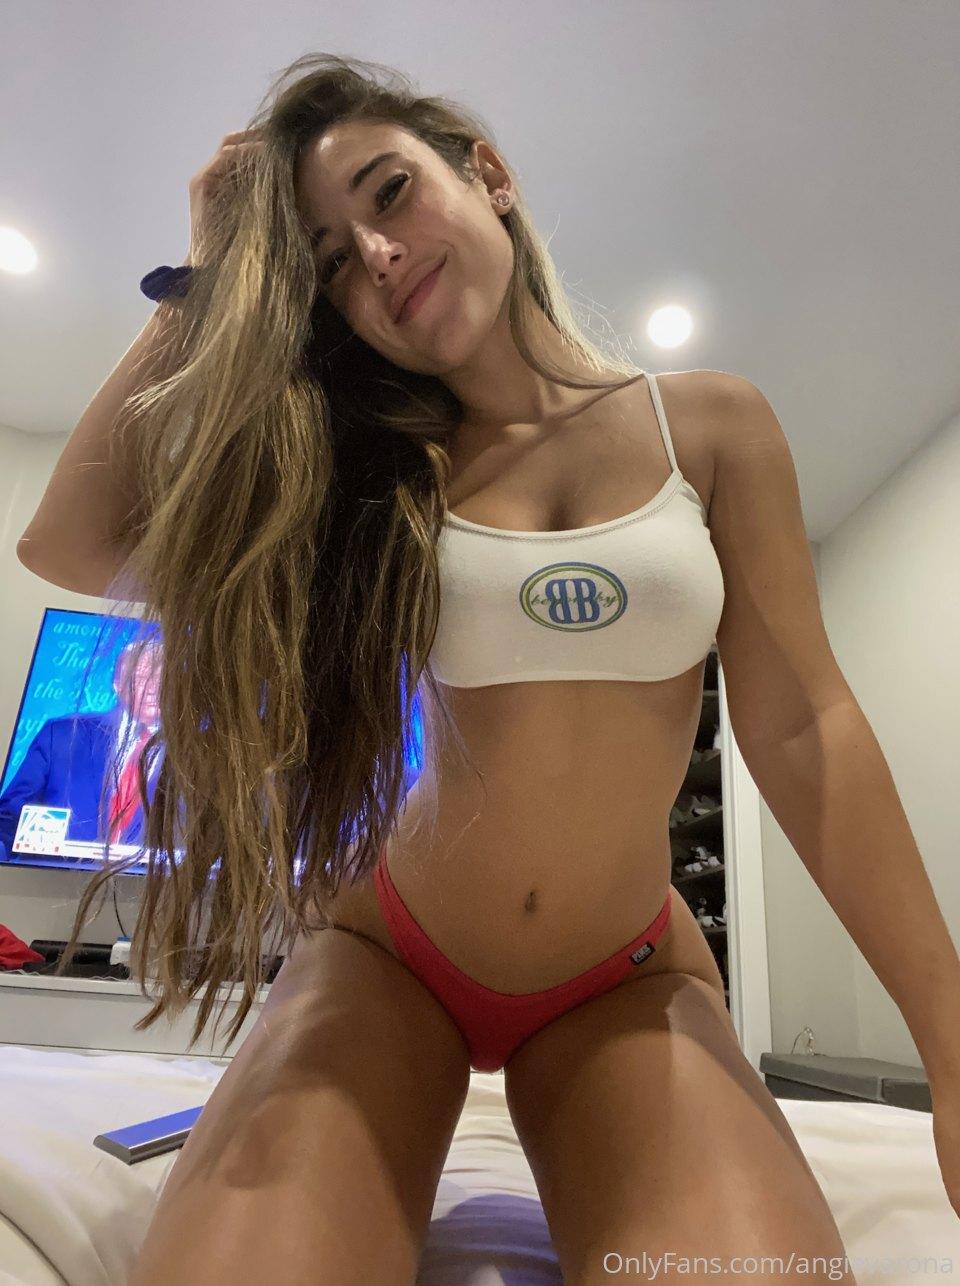 Angie Varona Onlyfans 0057